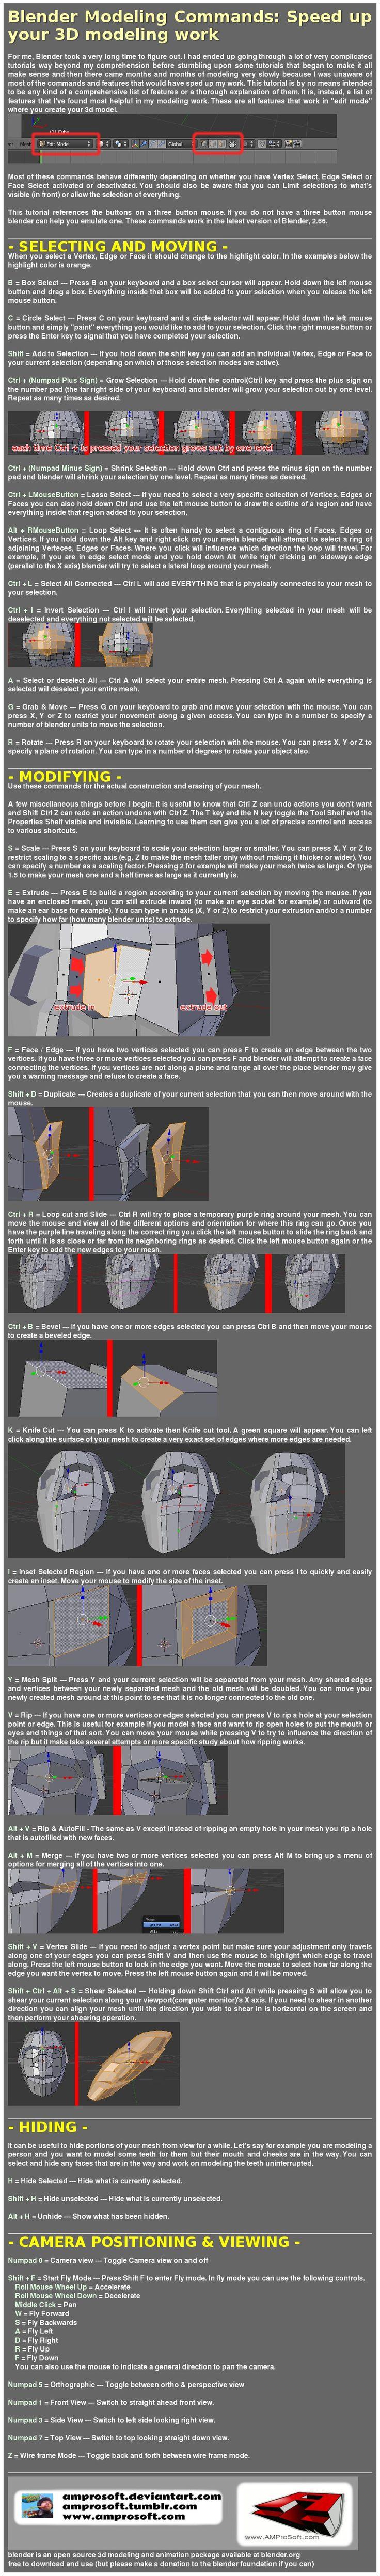 Blender 2 6 Character Modeling Tutorial : Best images about blender d on pinterest